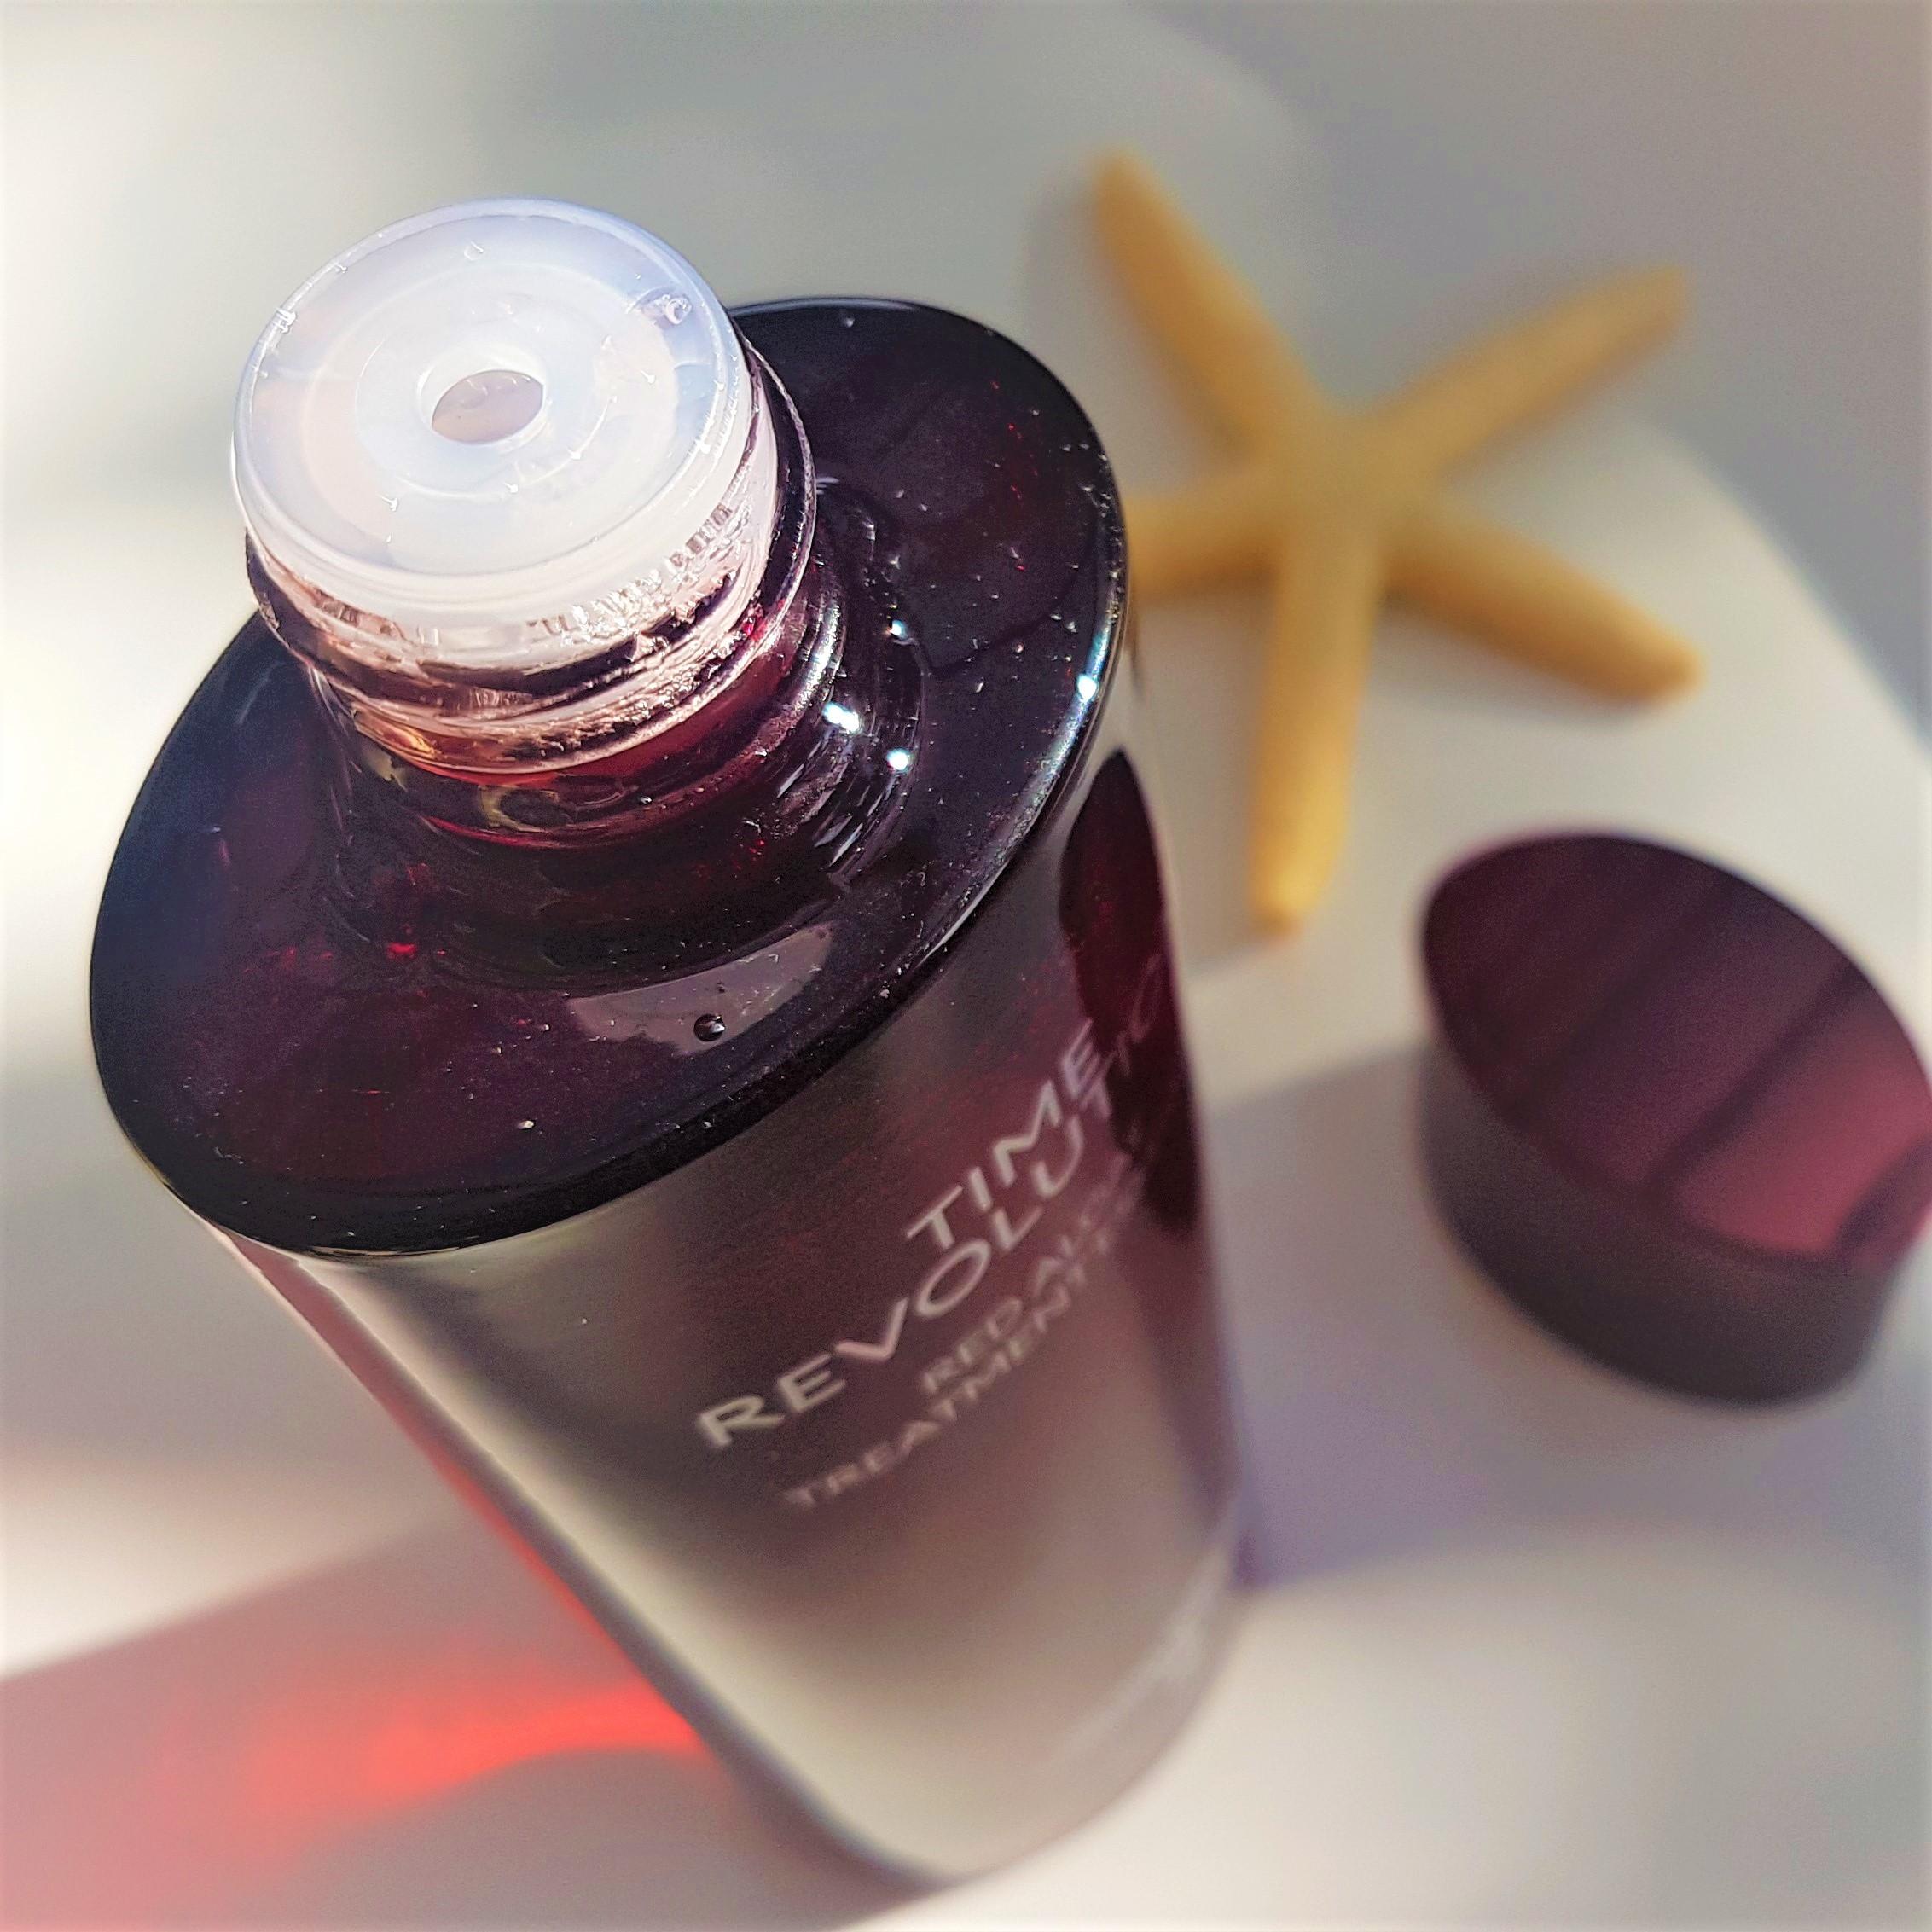 Missha Red Algae Treatment Essence Packaging